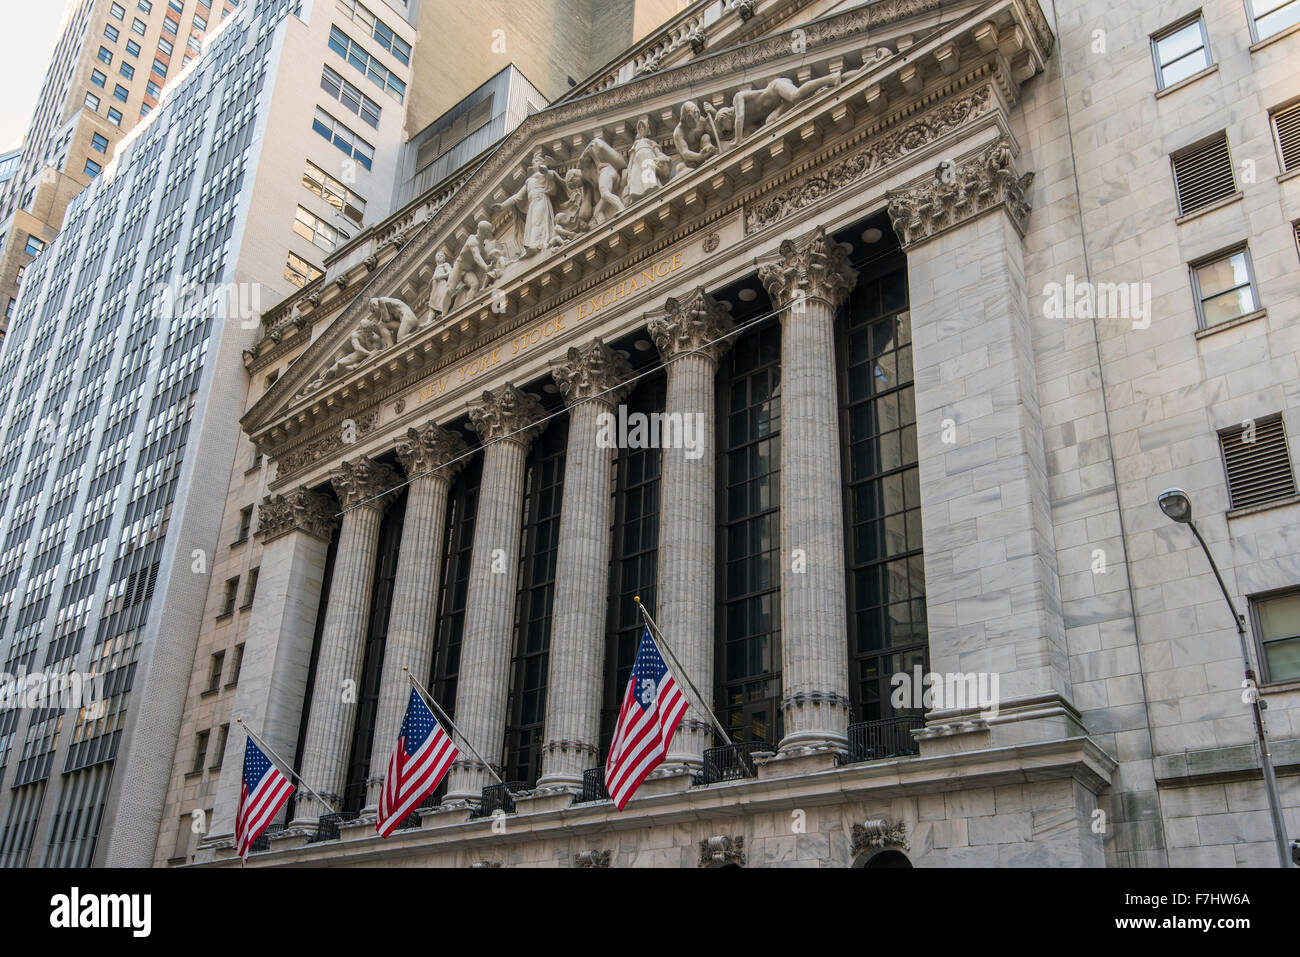 Bourse de New York, Wall Street, Lower Manhattan, New York, USA Photo Stock